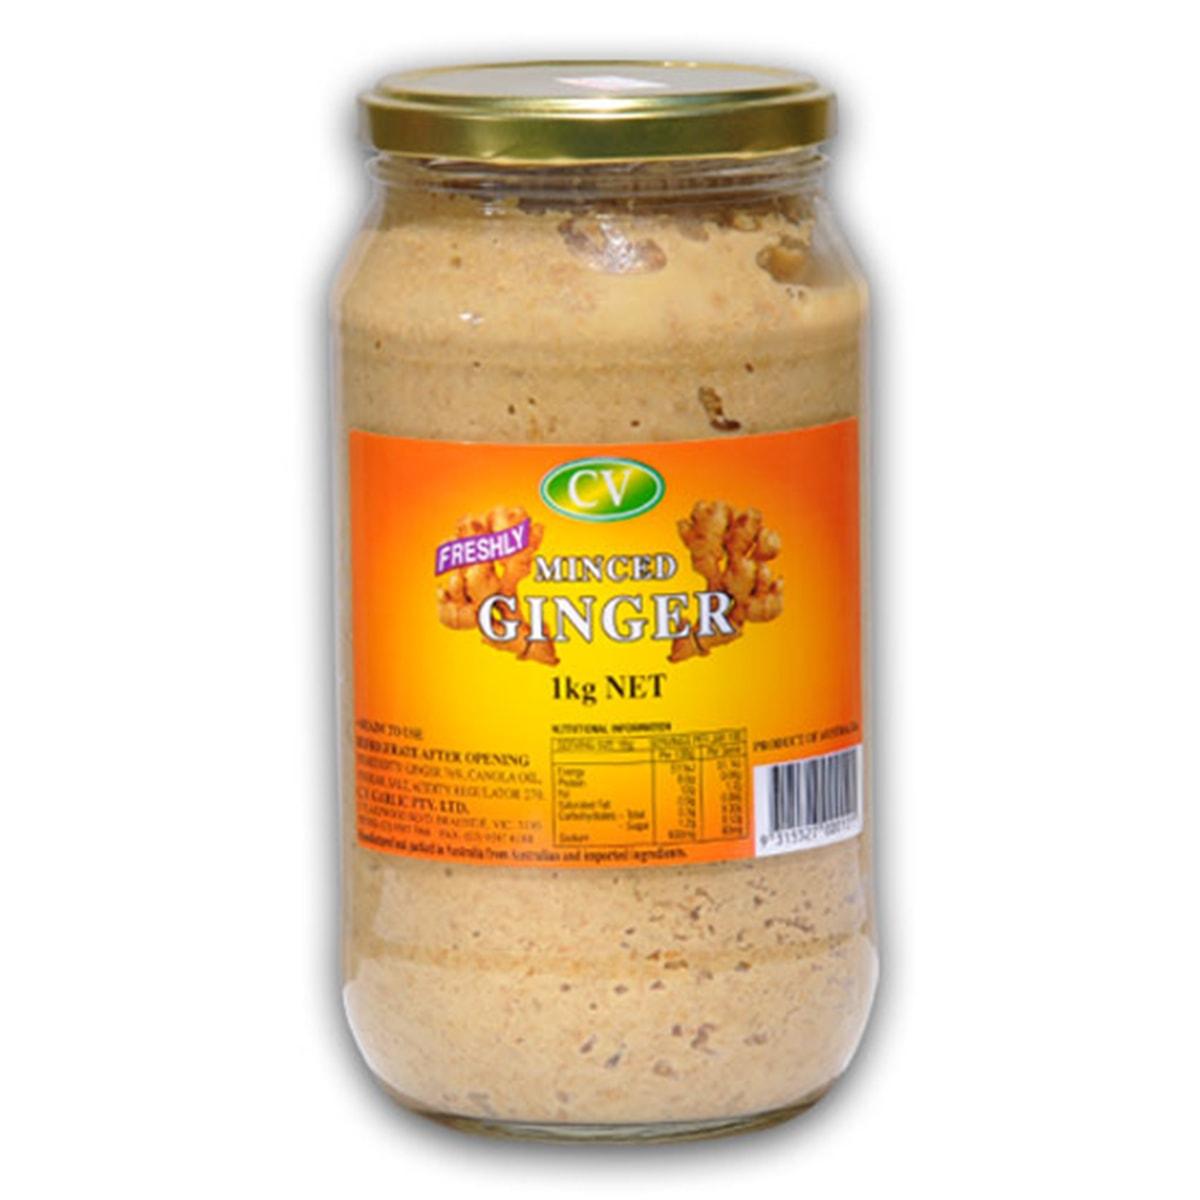 Buy CV Freshly Minced Ginger Paste - 1 kg